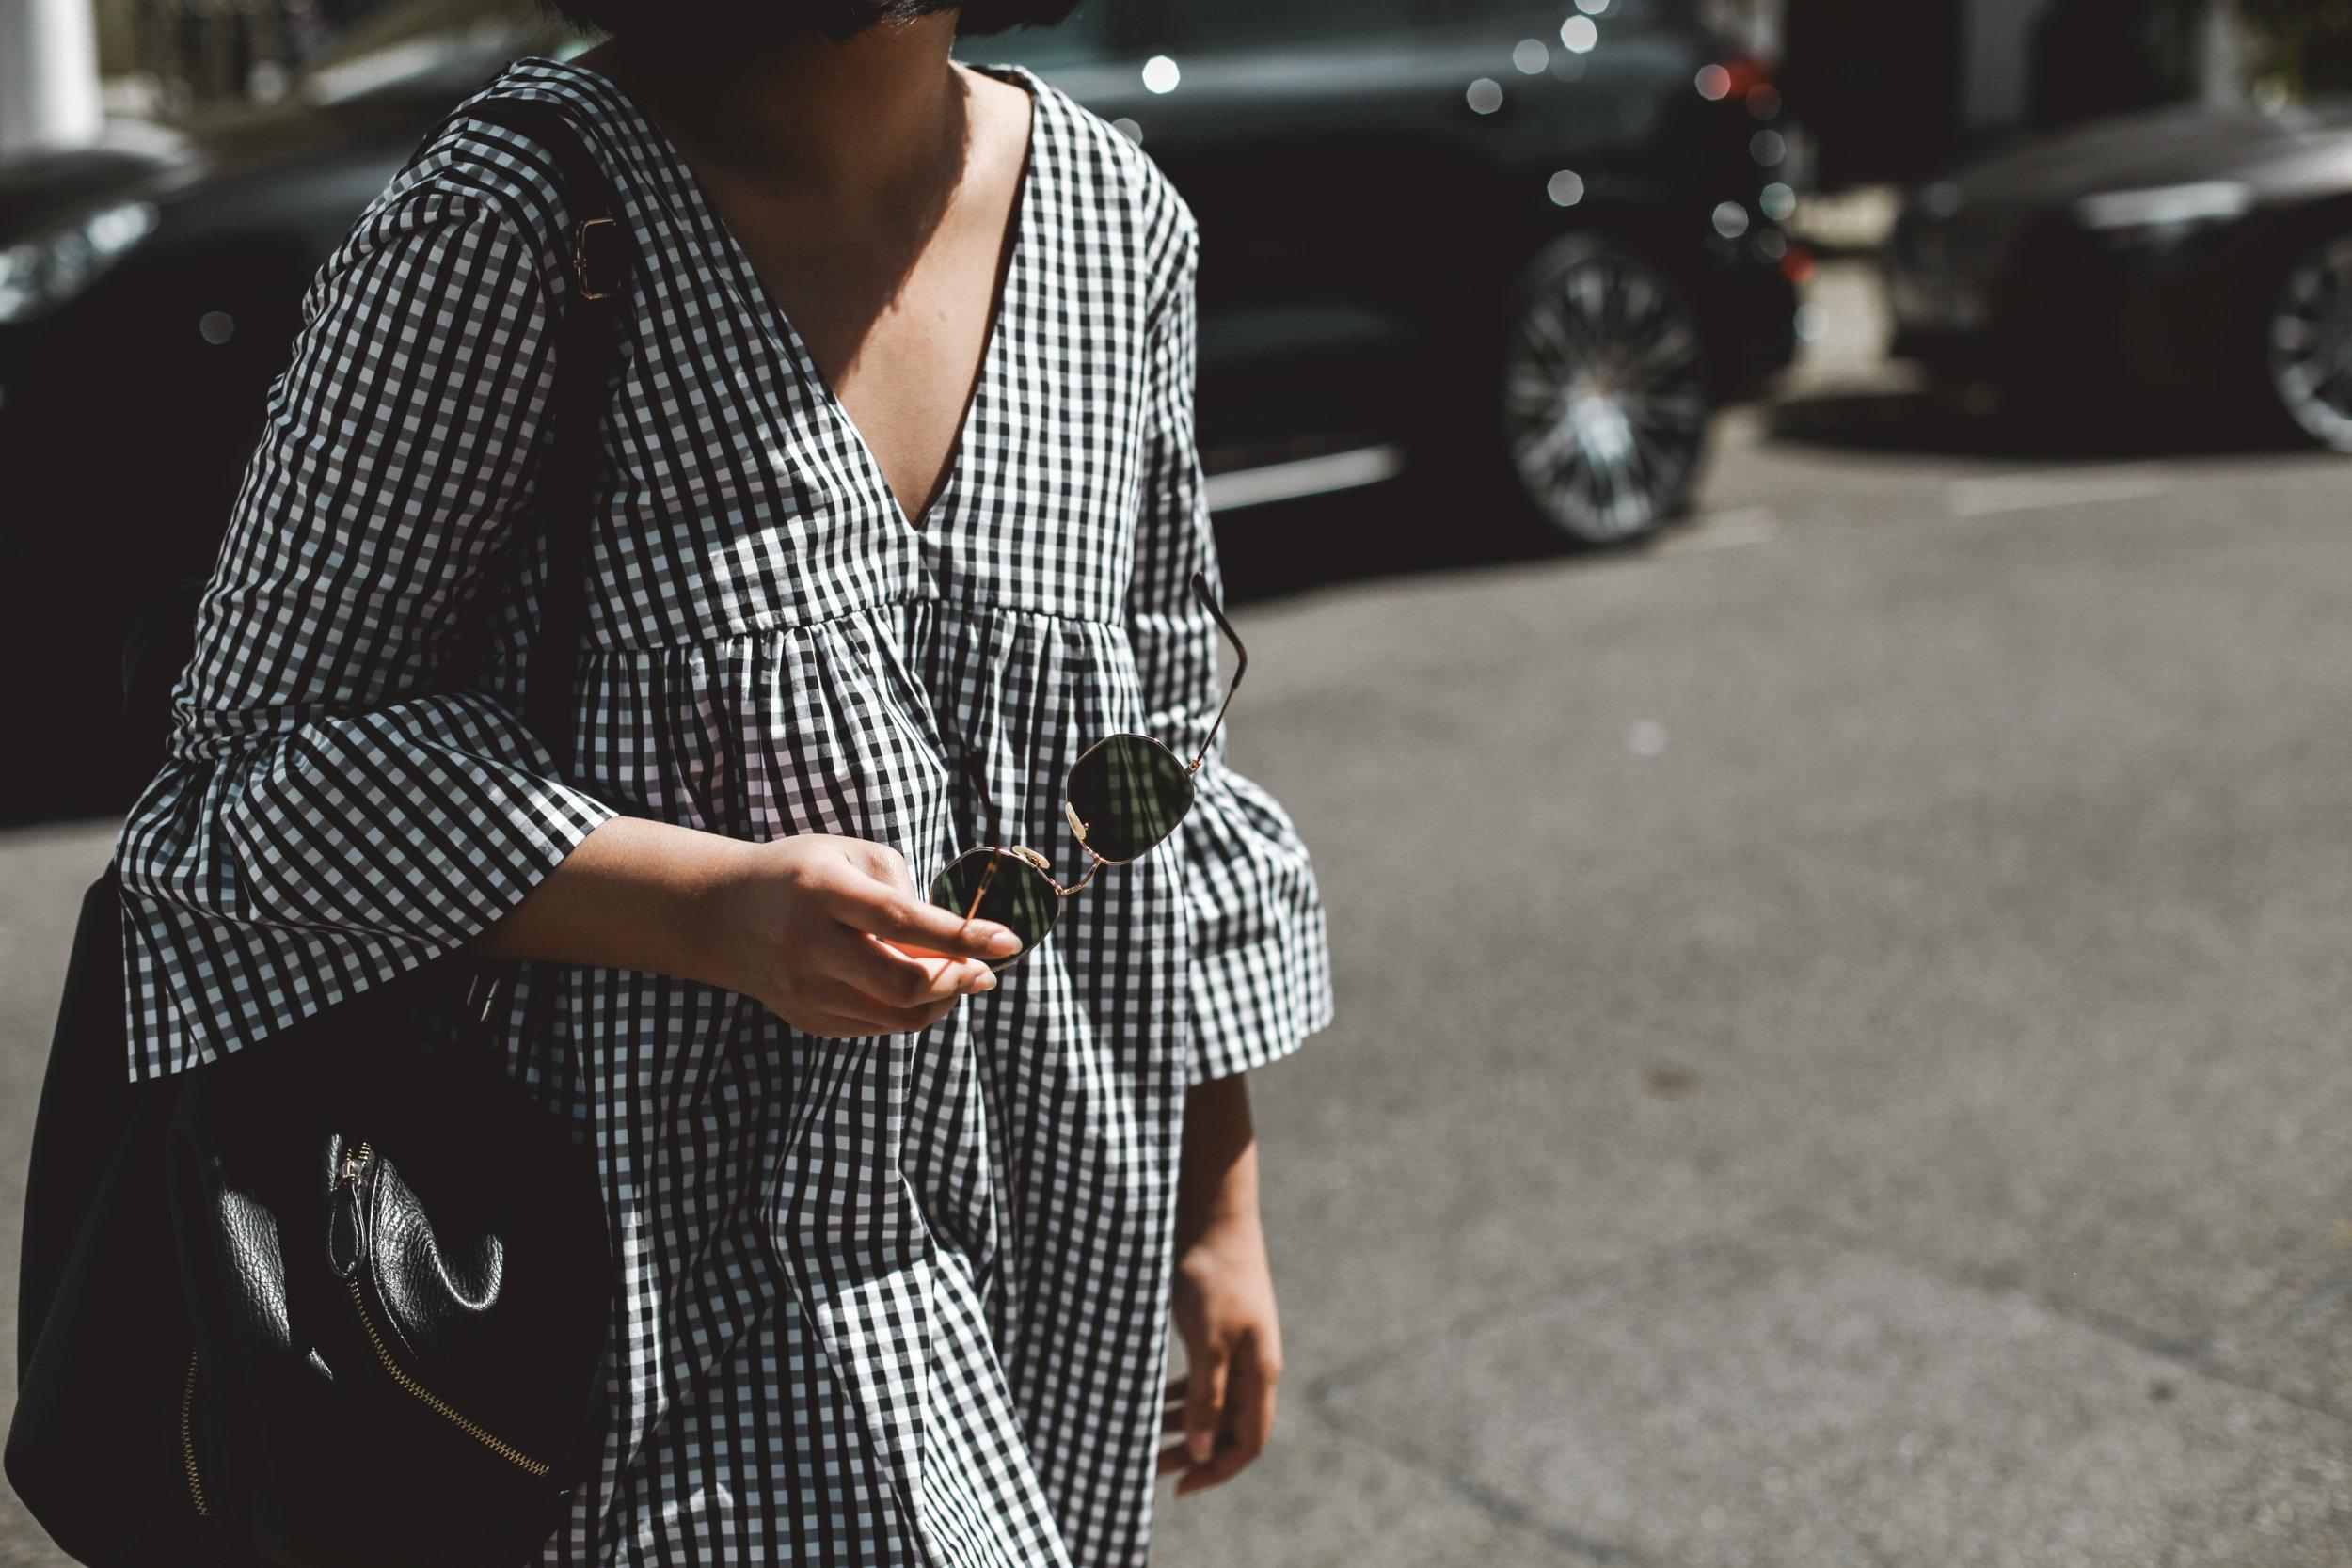 What I'm wearing... - Dress - ZaraShoes - TUK CreepersBag - Urban OutfittersSunglasses - Ray-Ban